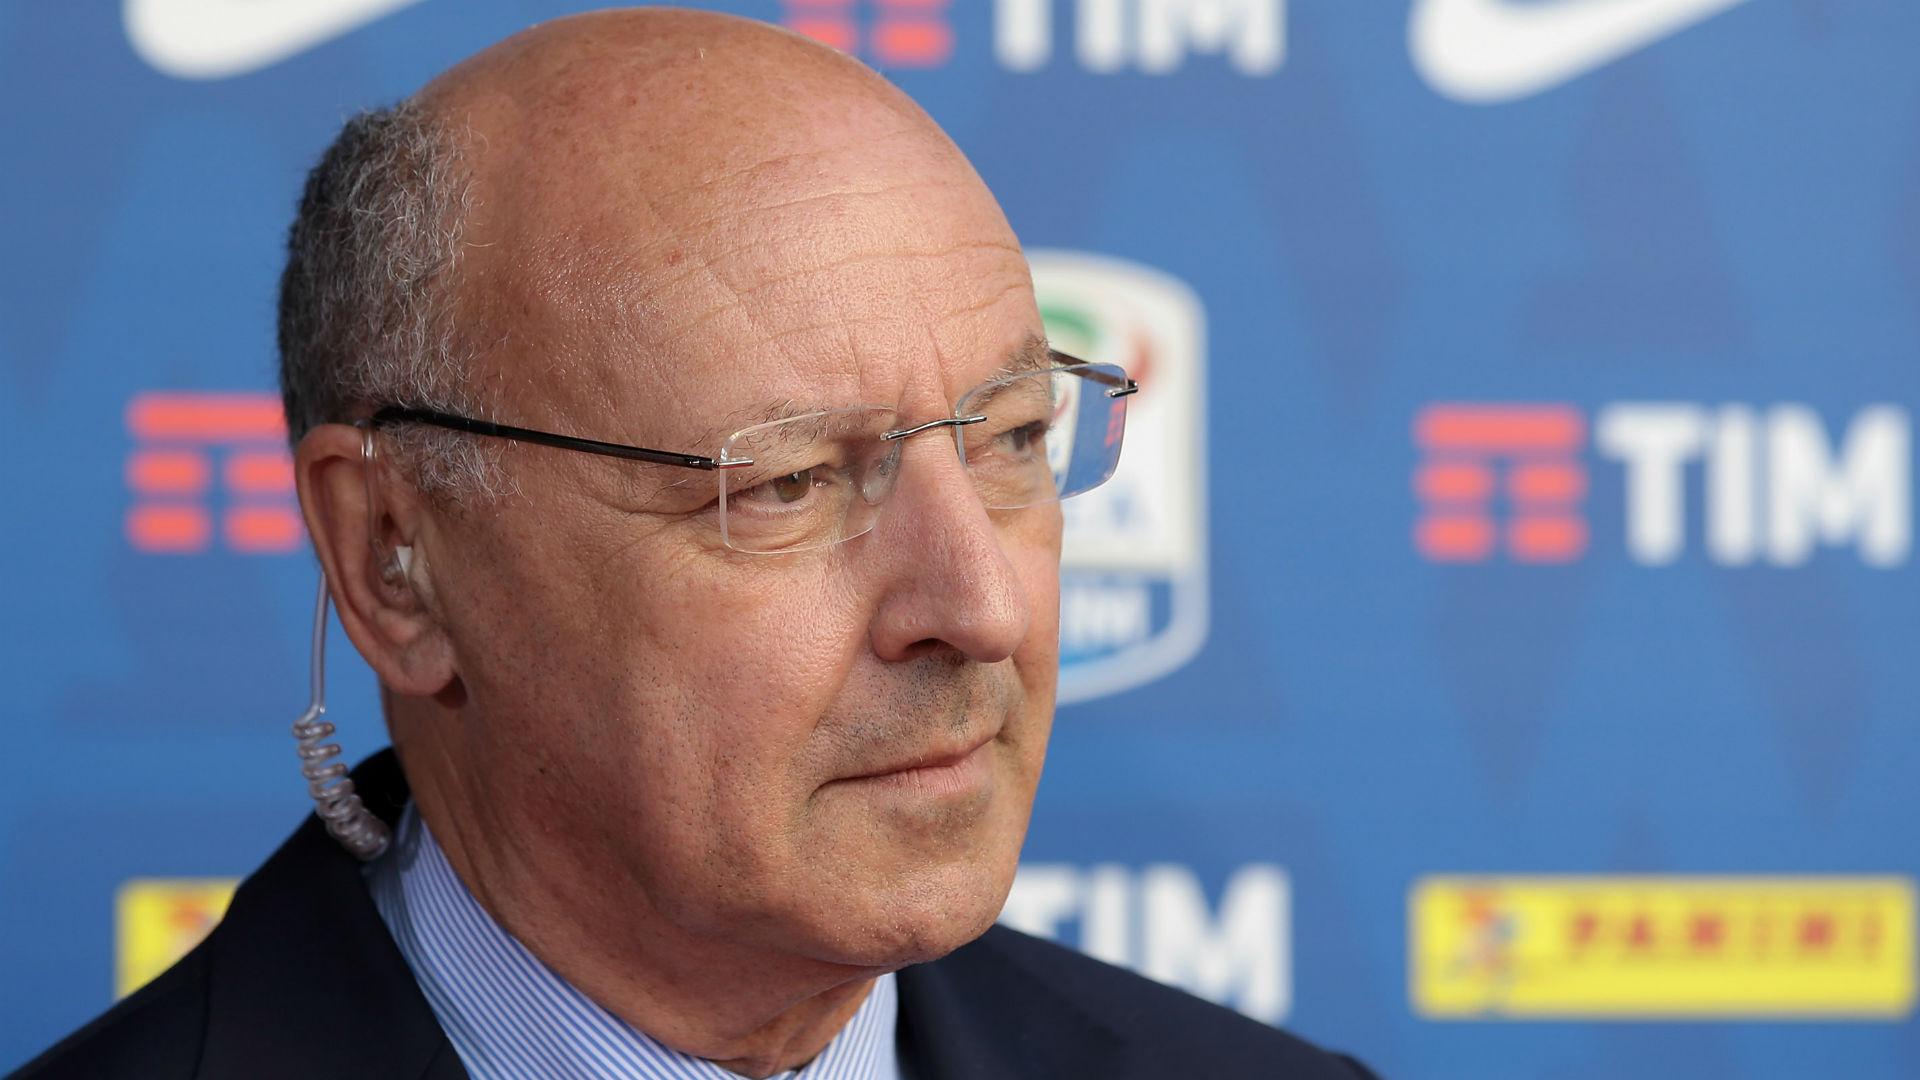 Former Juventus director Giuseppe Marotta joins Inter Milan